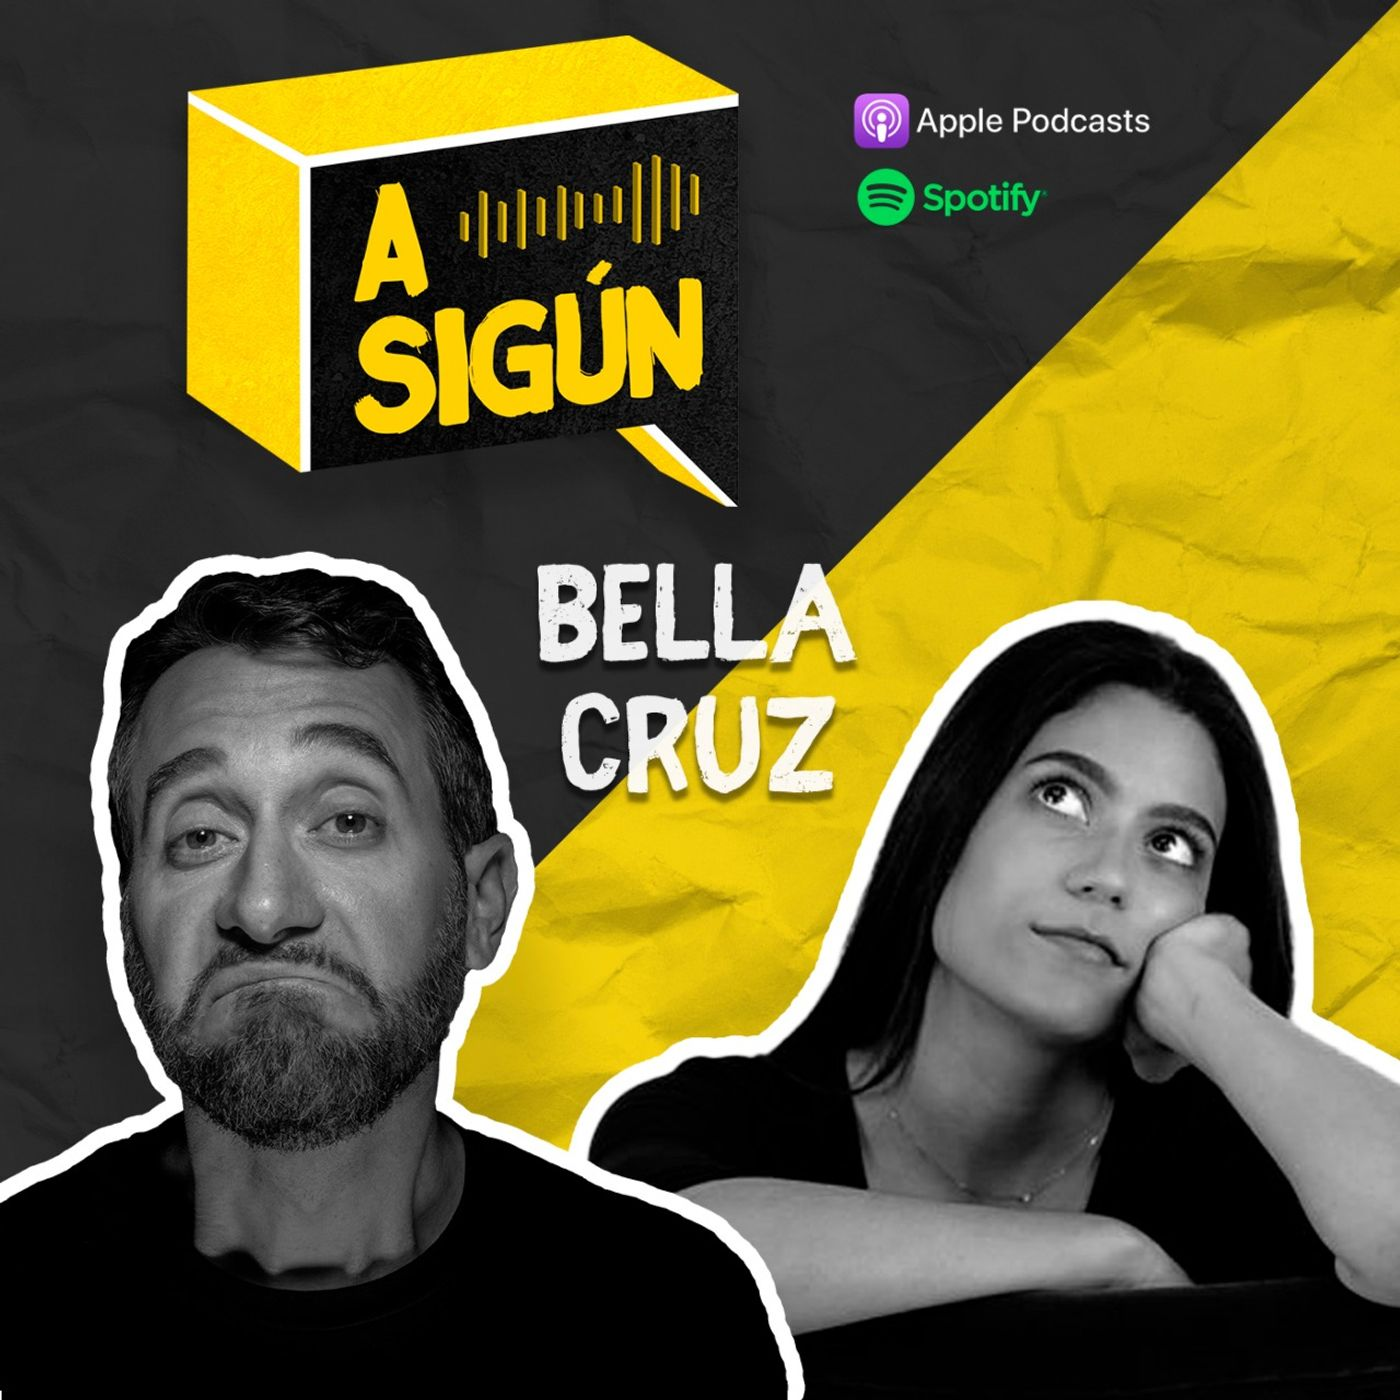 008. A SIGÚN: Isabella Cruz (Bella Break).